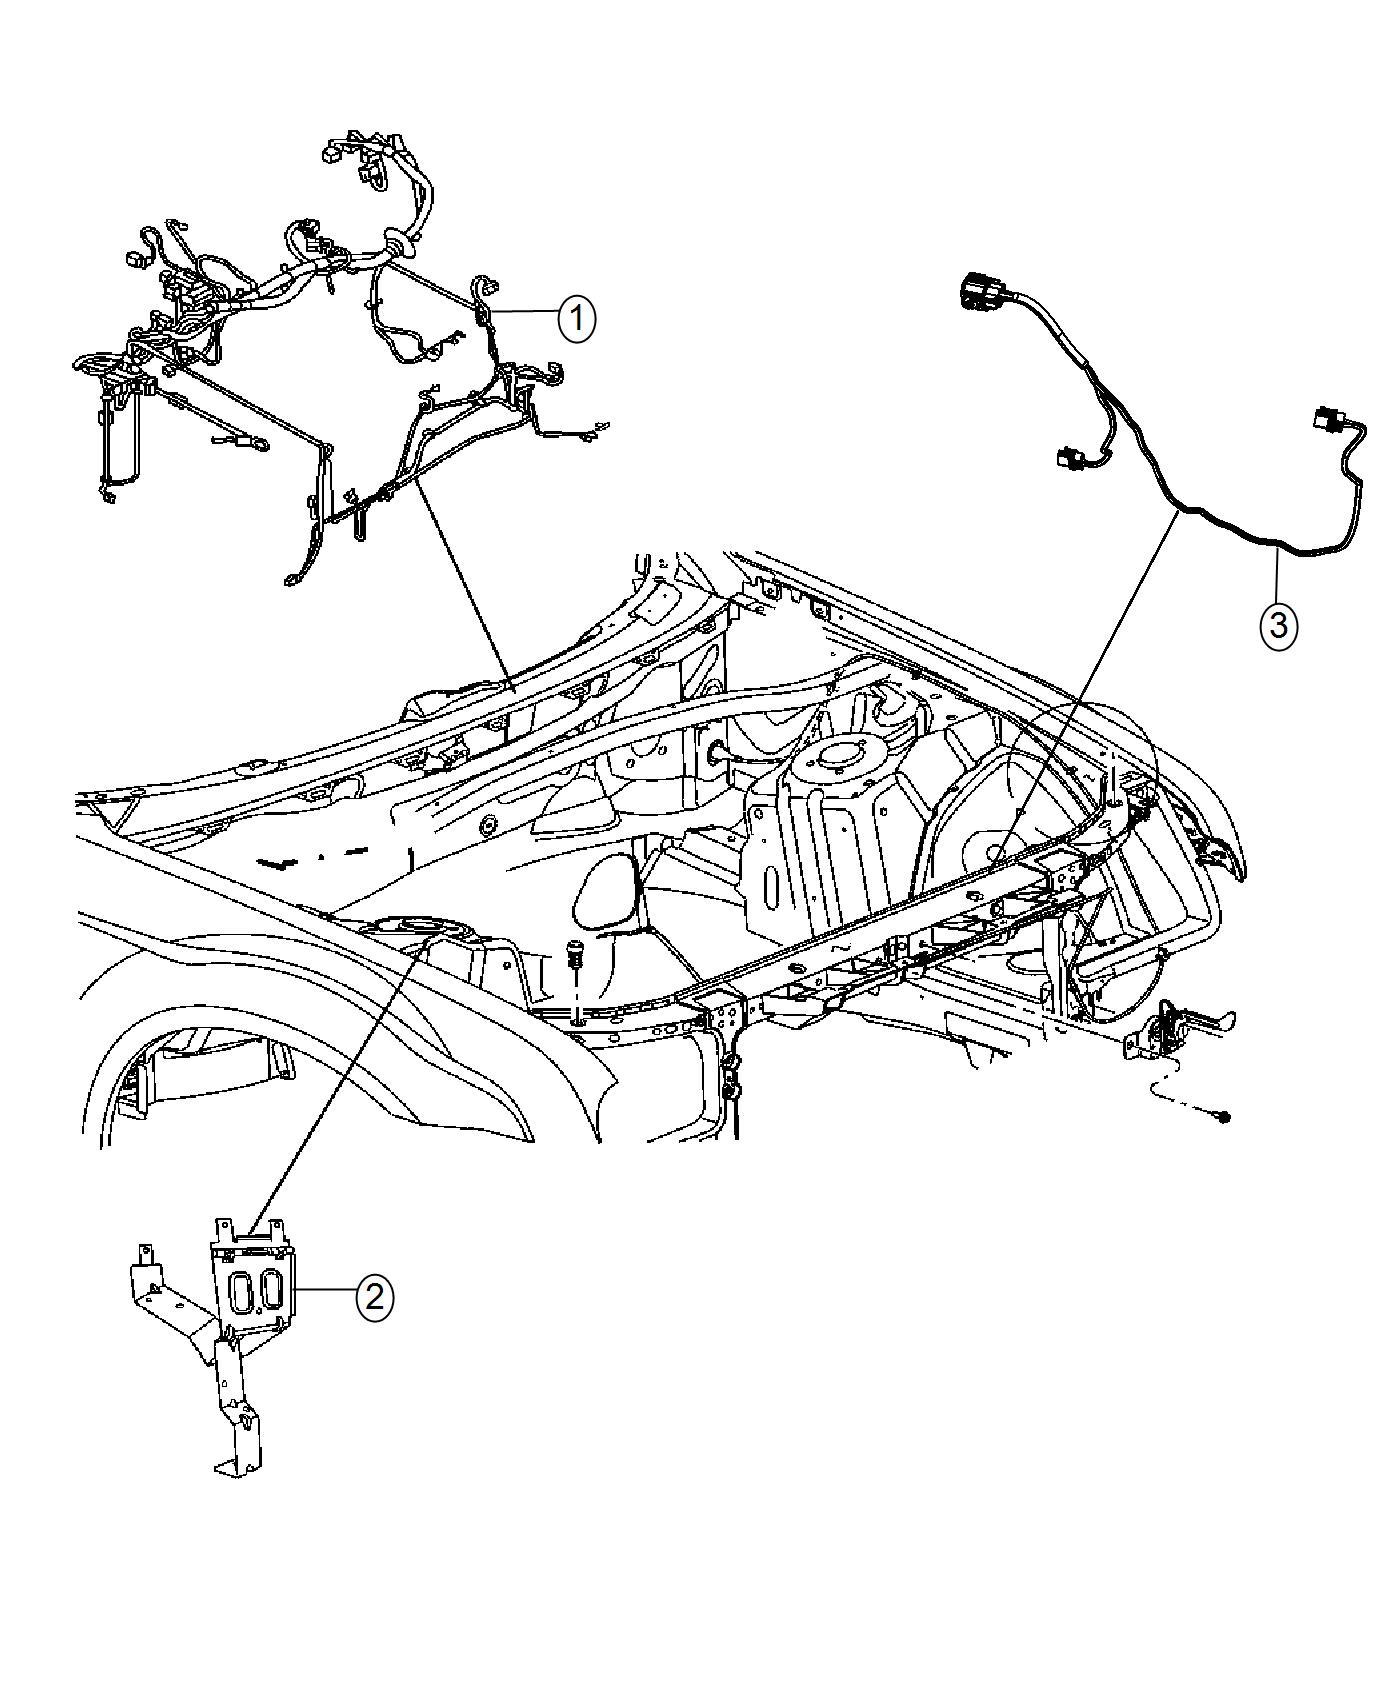 Dodge Charger Wiring Headlamp To Dash Stop Optics